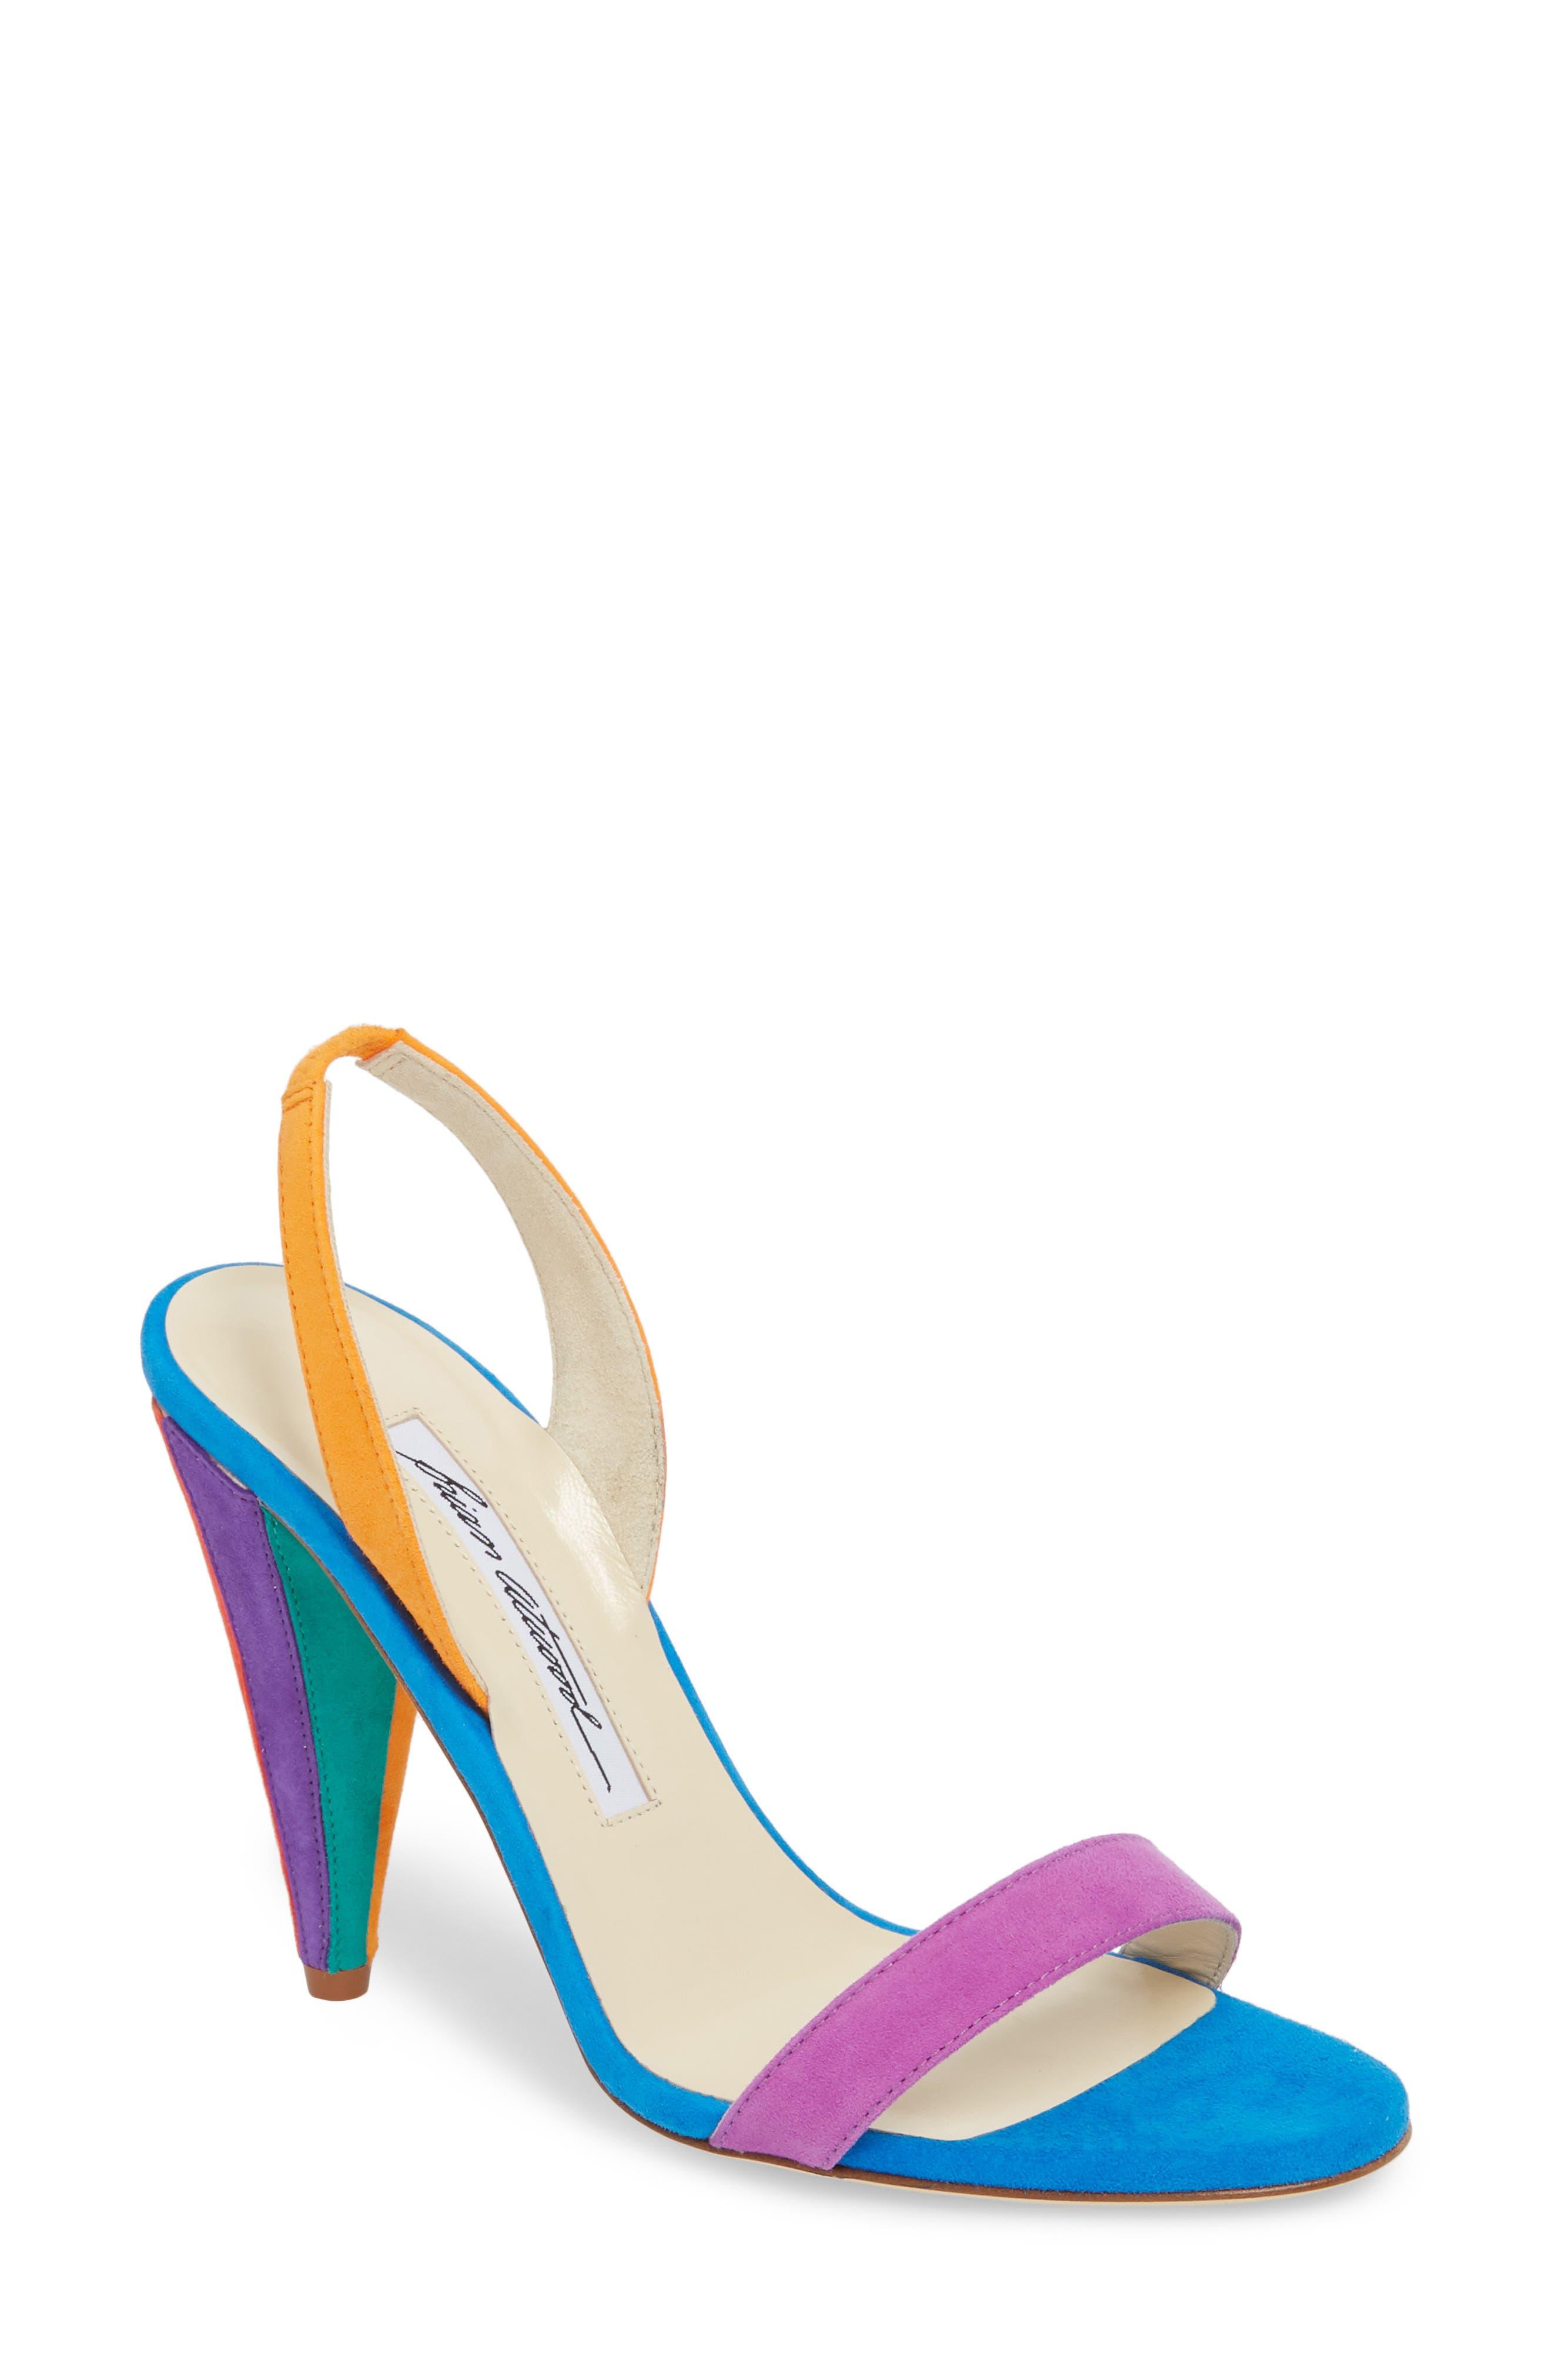 BRIAN ATWOOD Women's Susii Cone Heel Sandal OL54l